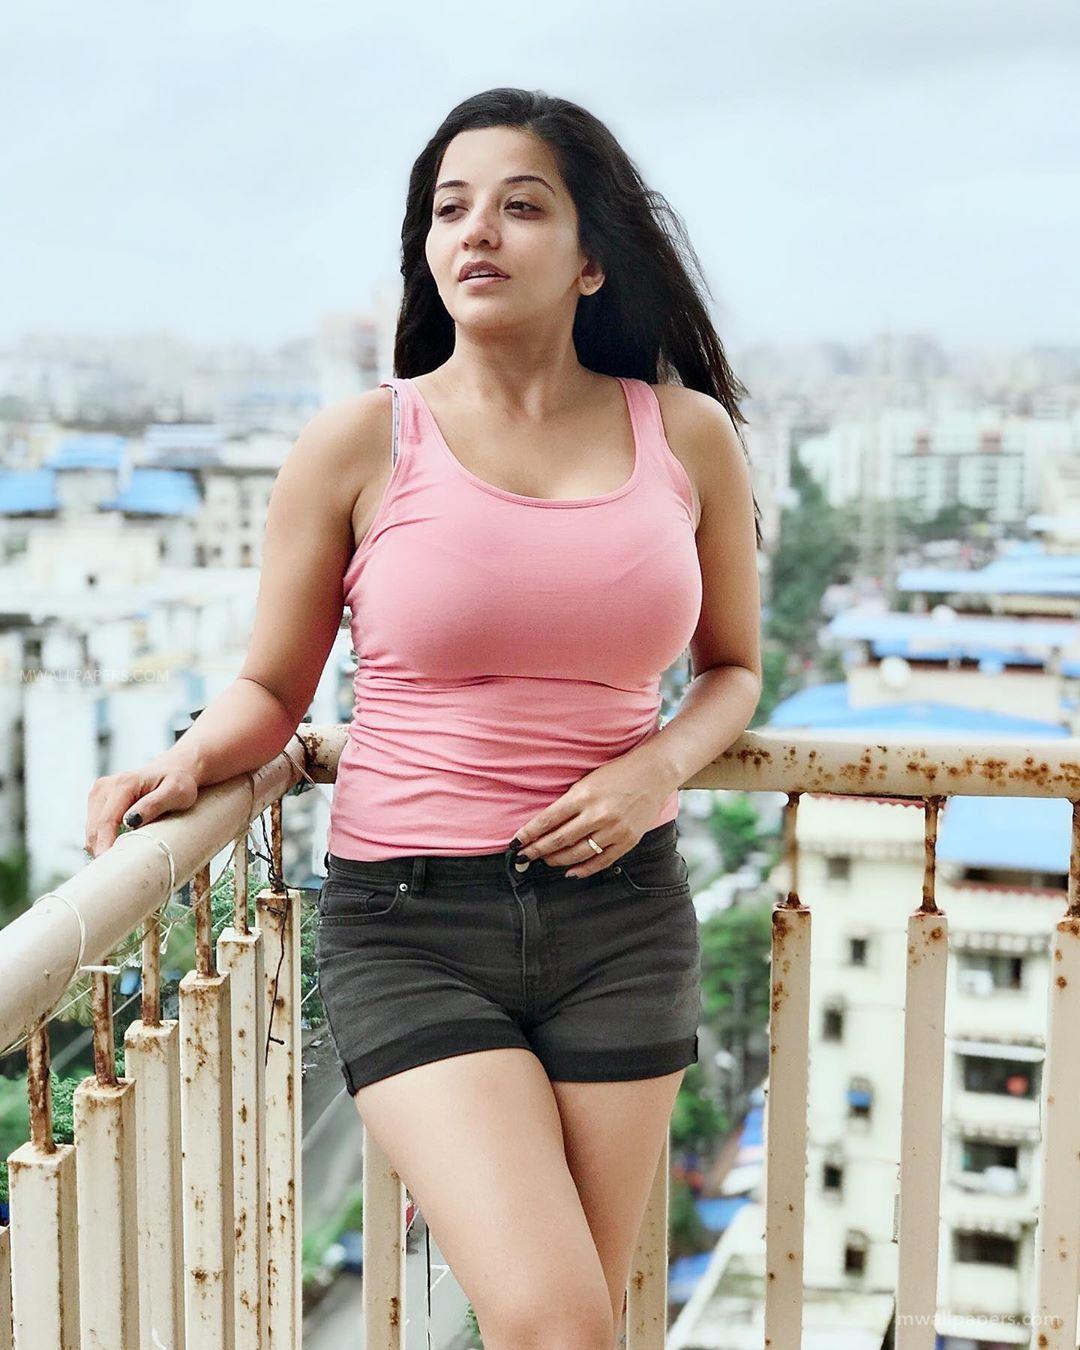 Mona Lisa Hd Wallpapers Desktop Background Android Indian Actress Sexy Dress 1080x1350 Wallpaper Teahub Io